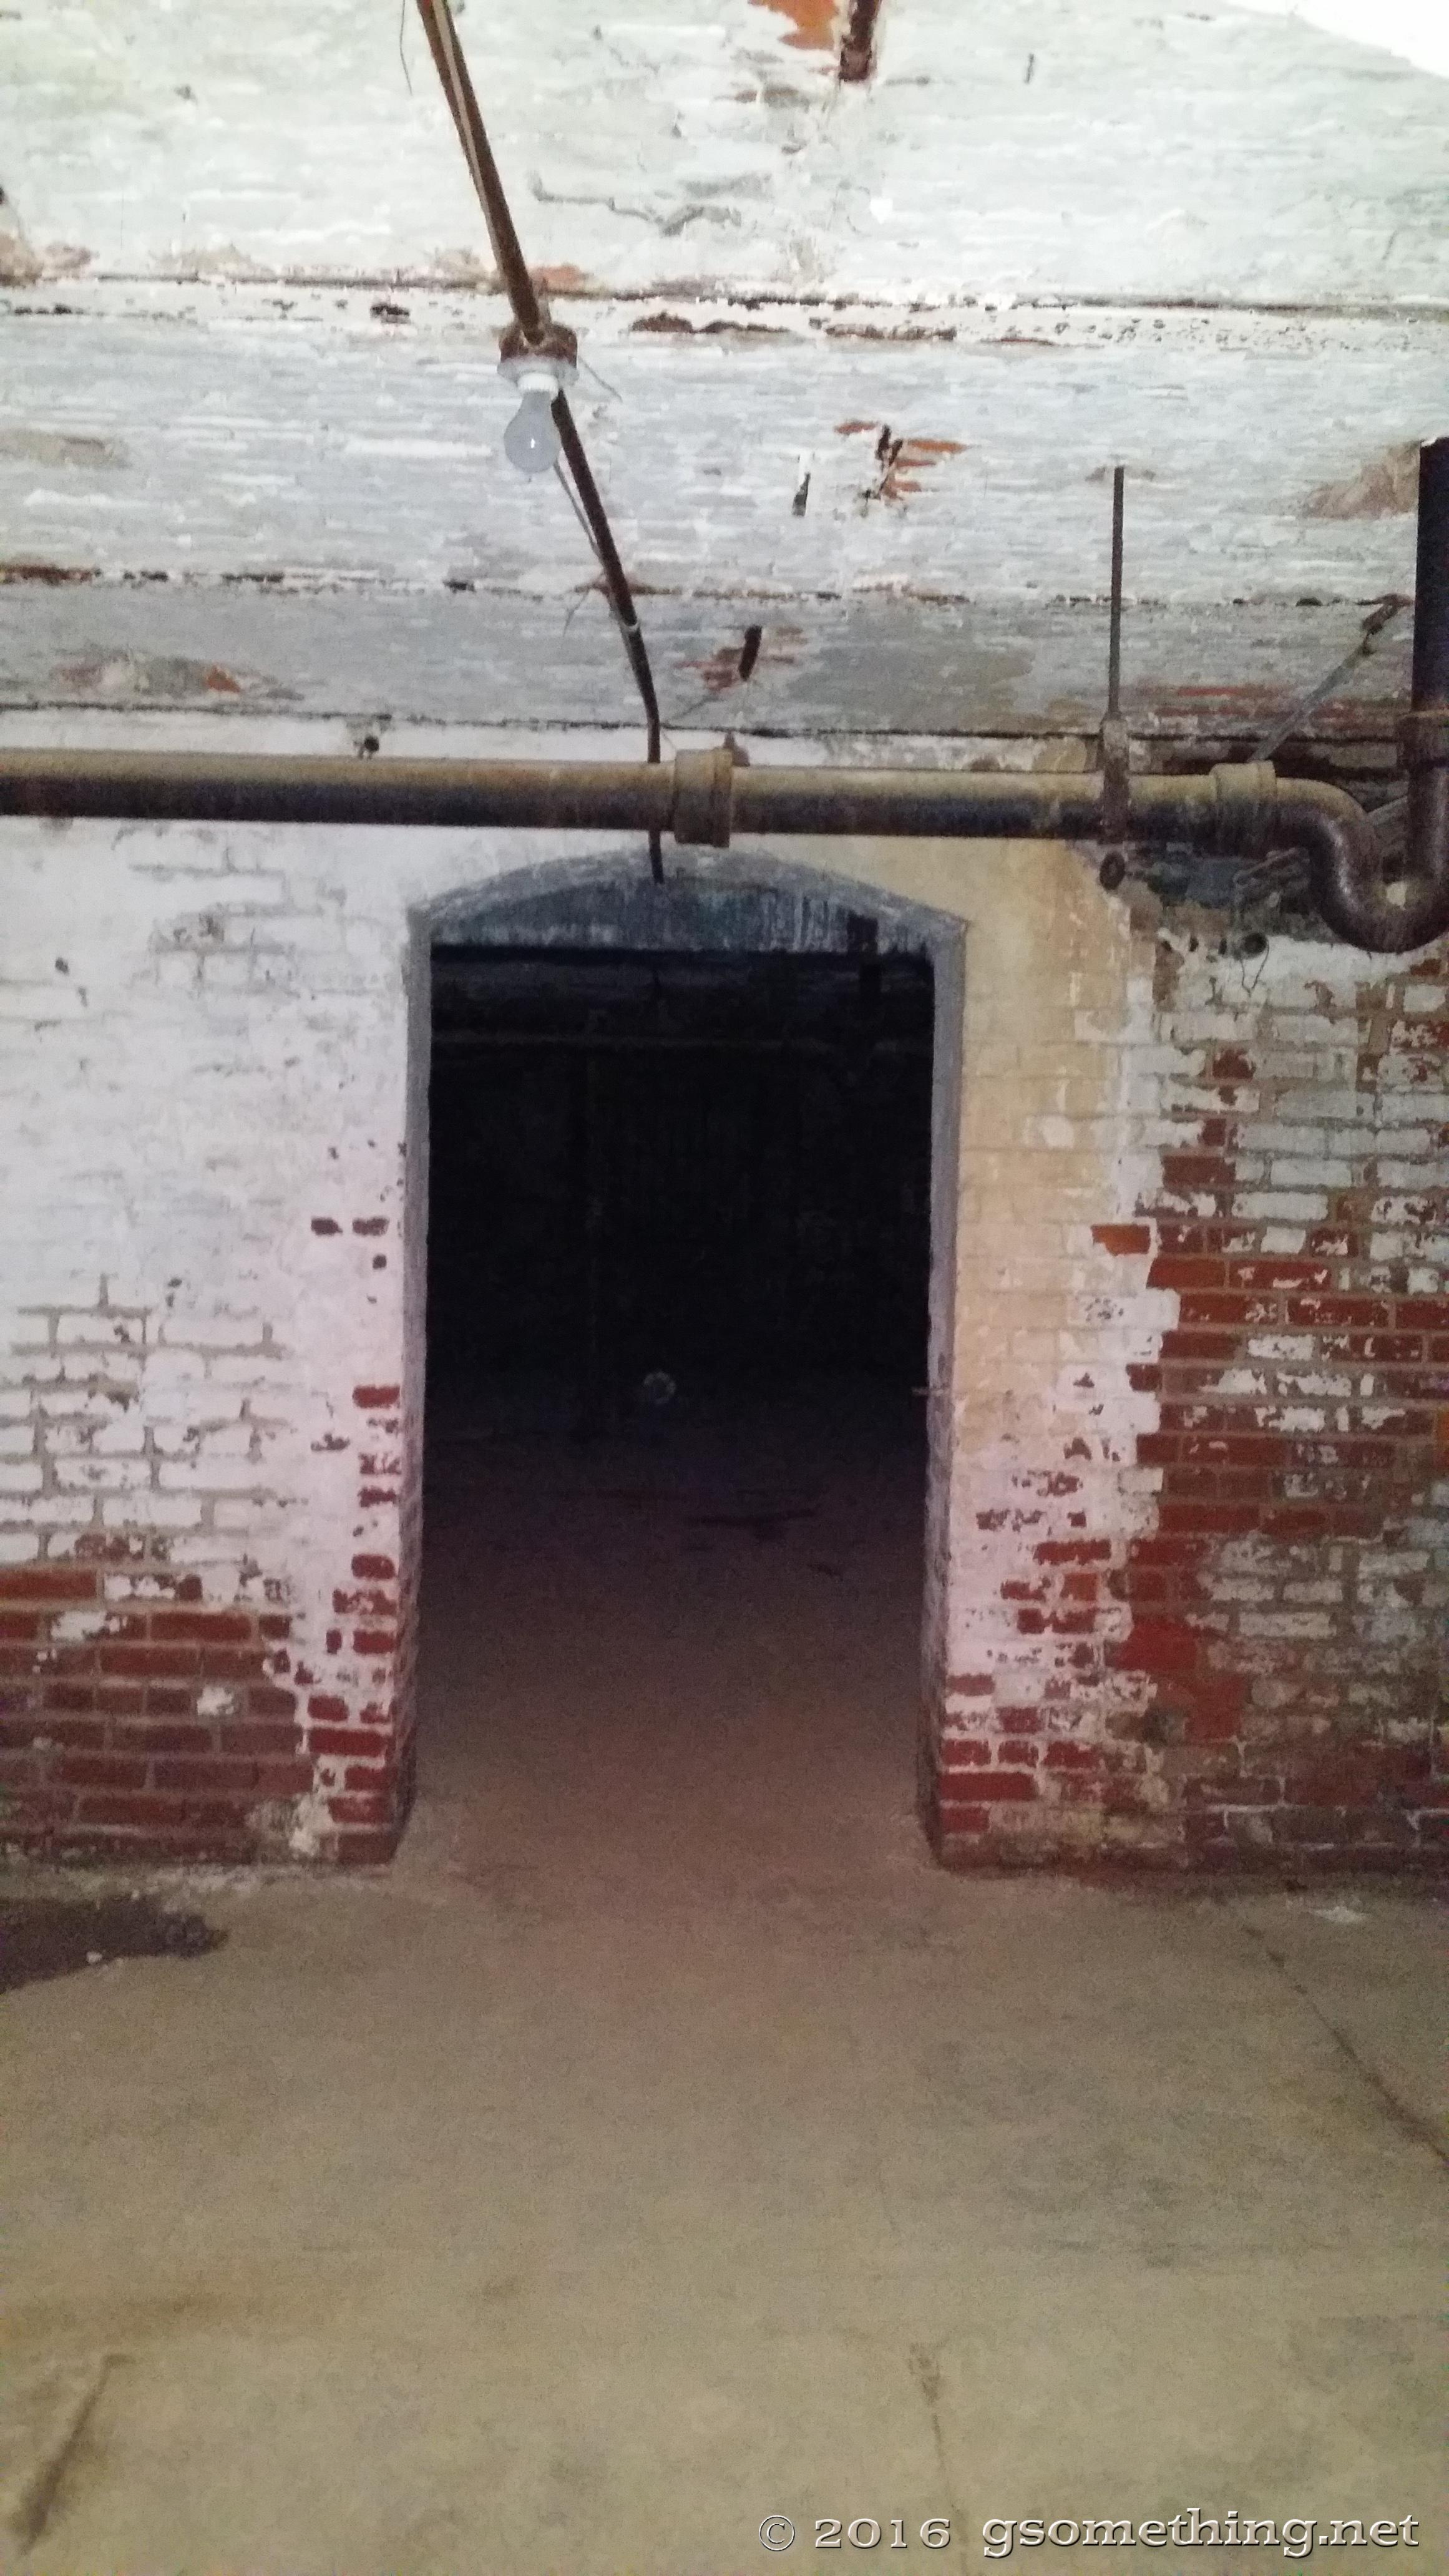 mansfield_reformatory_2nd_trip_151.jpg